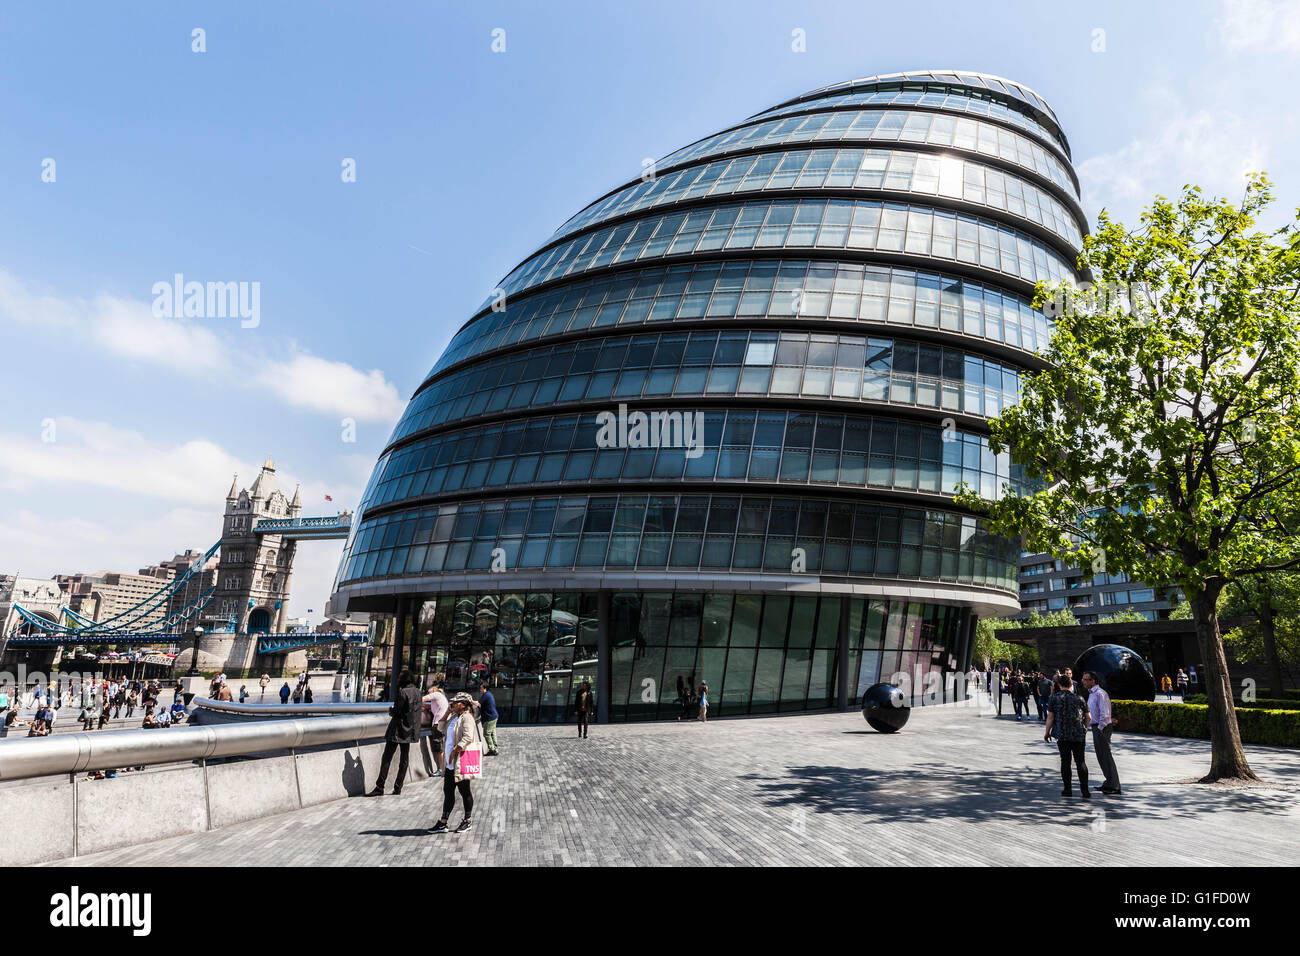 London City Hall (Assembly Building), Borough of Southwark, England, SE1, UK. - Stock Image